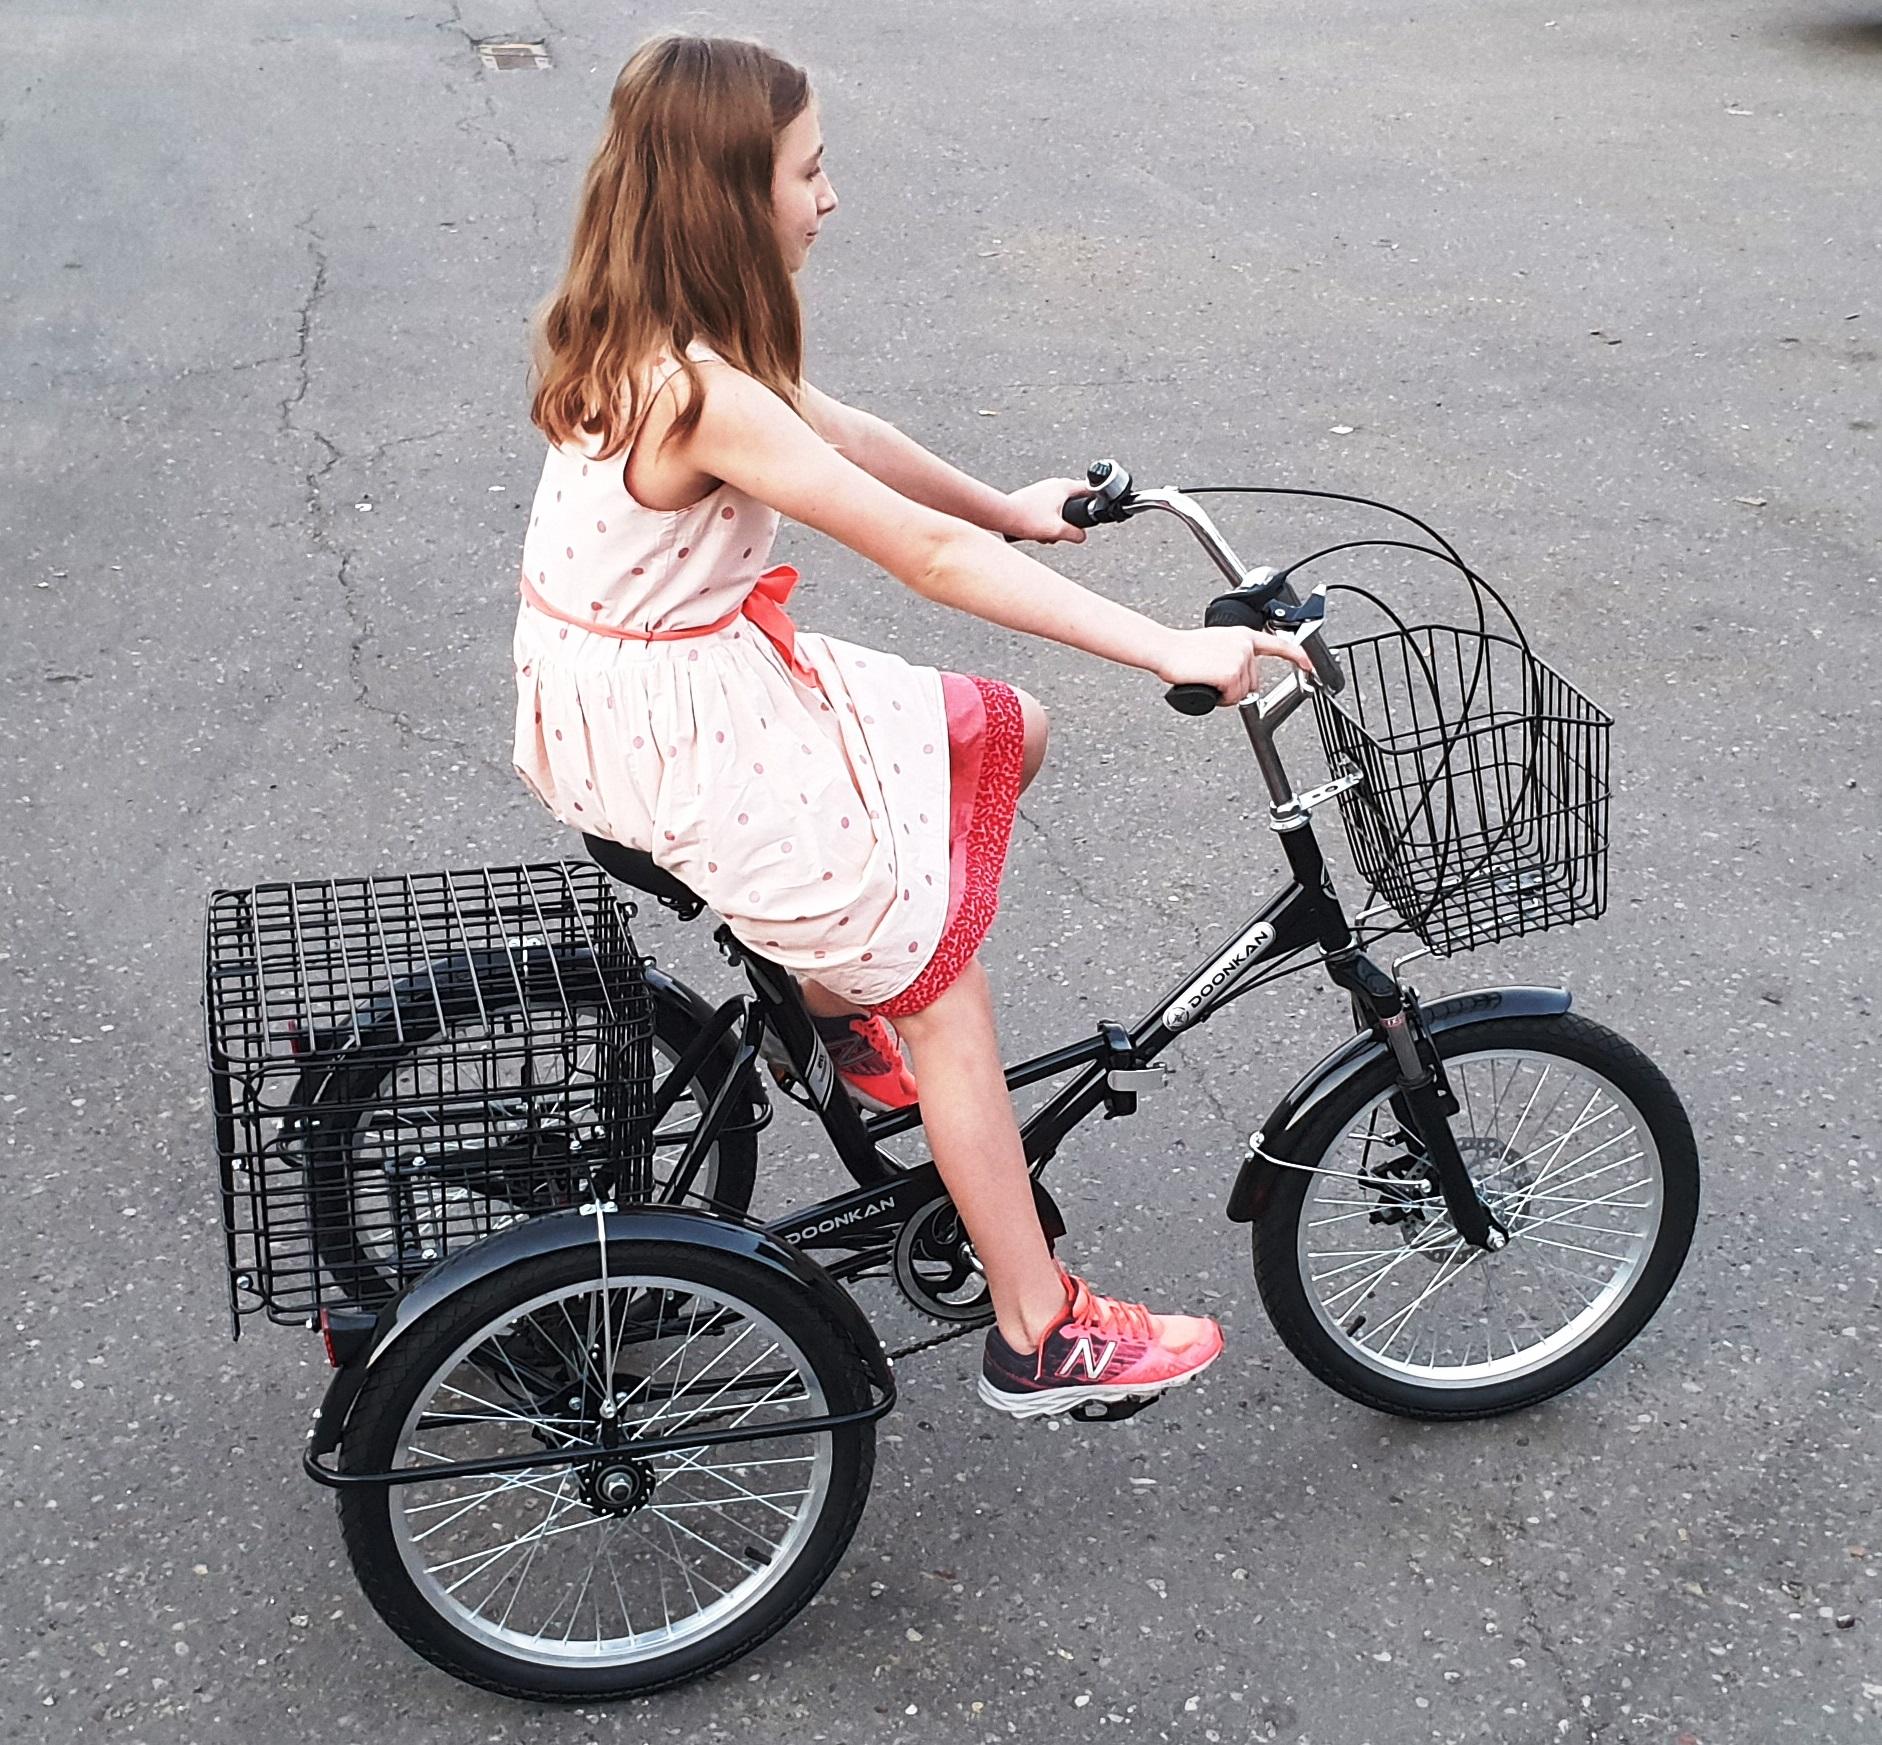 Doonkan Trike Трицикл трайк трехколесный велосипед